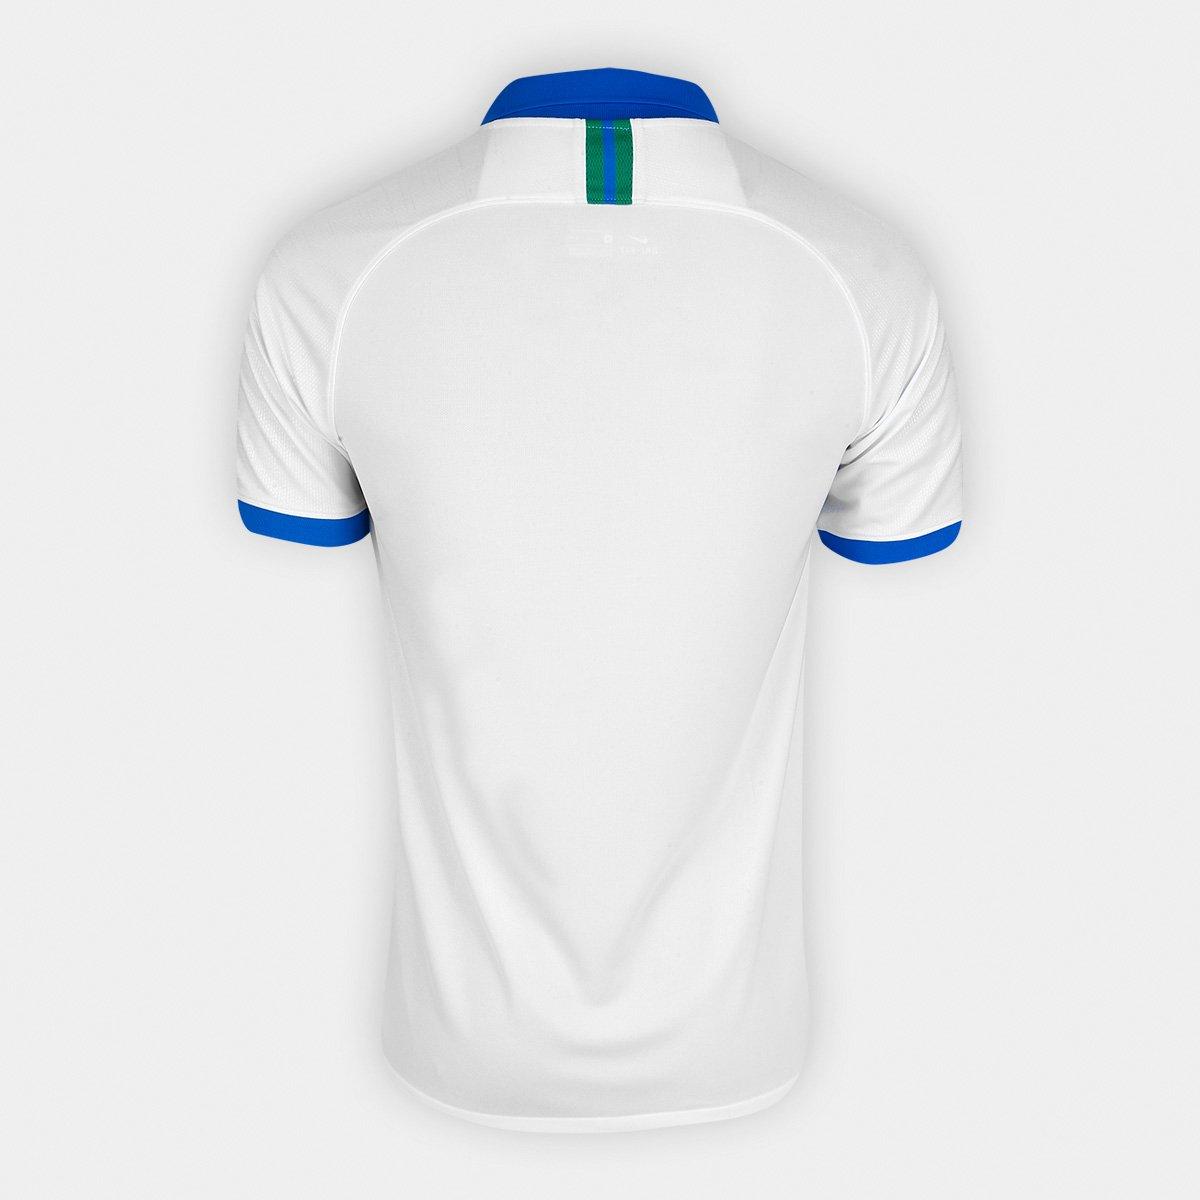 Camisa Seleção Brasil III 19/20 s/nº Torcedor Nike Masculina - Tam: M - 1